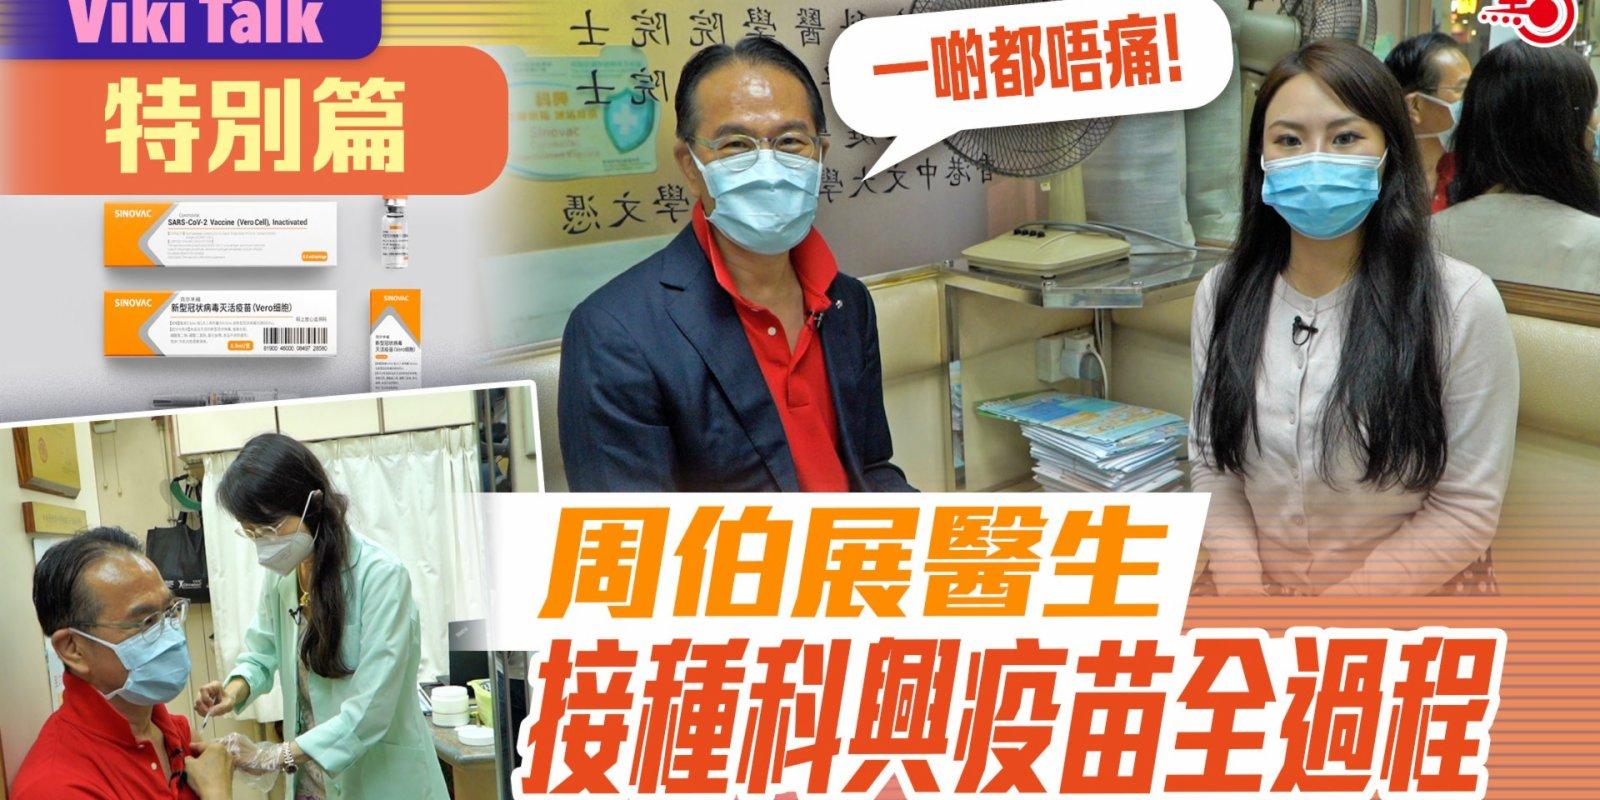 Viki Talk特別篇|周伯展醫生接種科興疫苗全過程:「一啲都唔痛!」